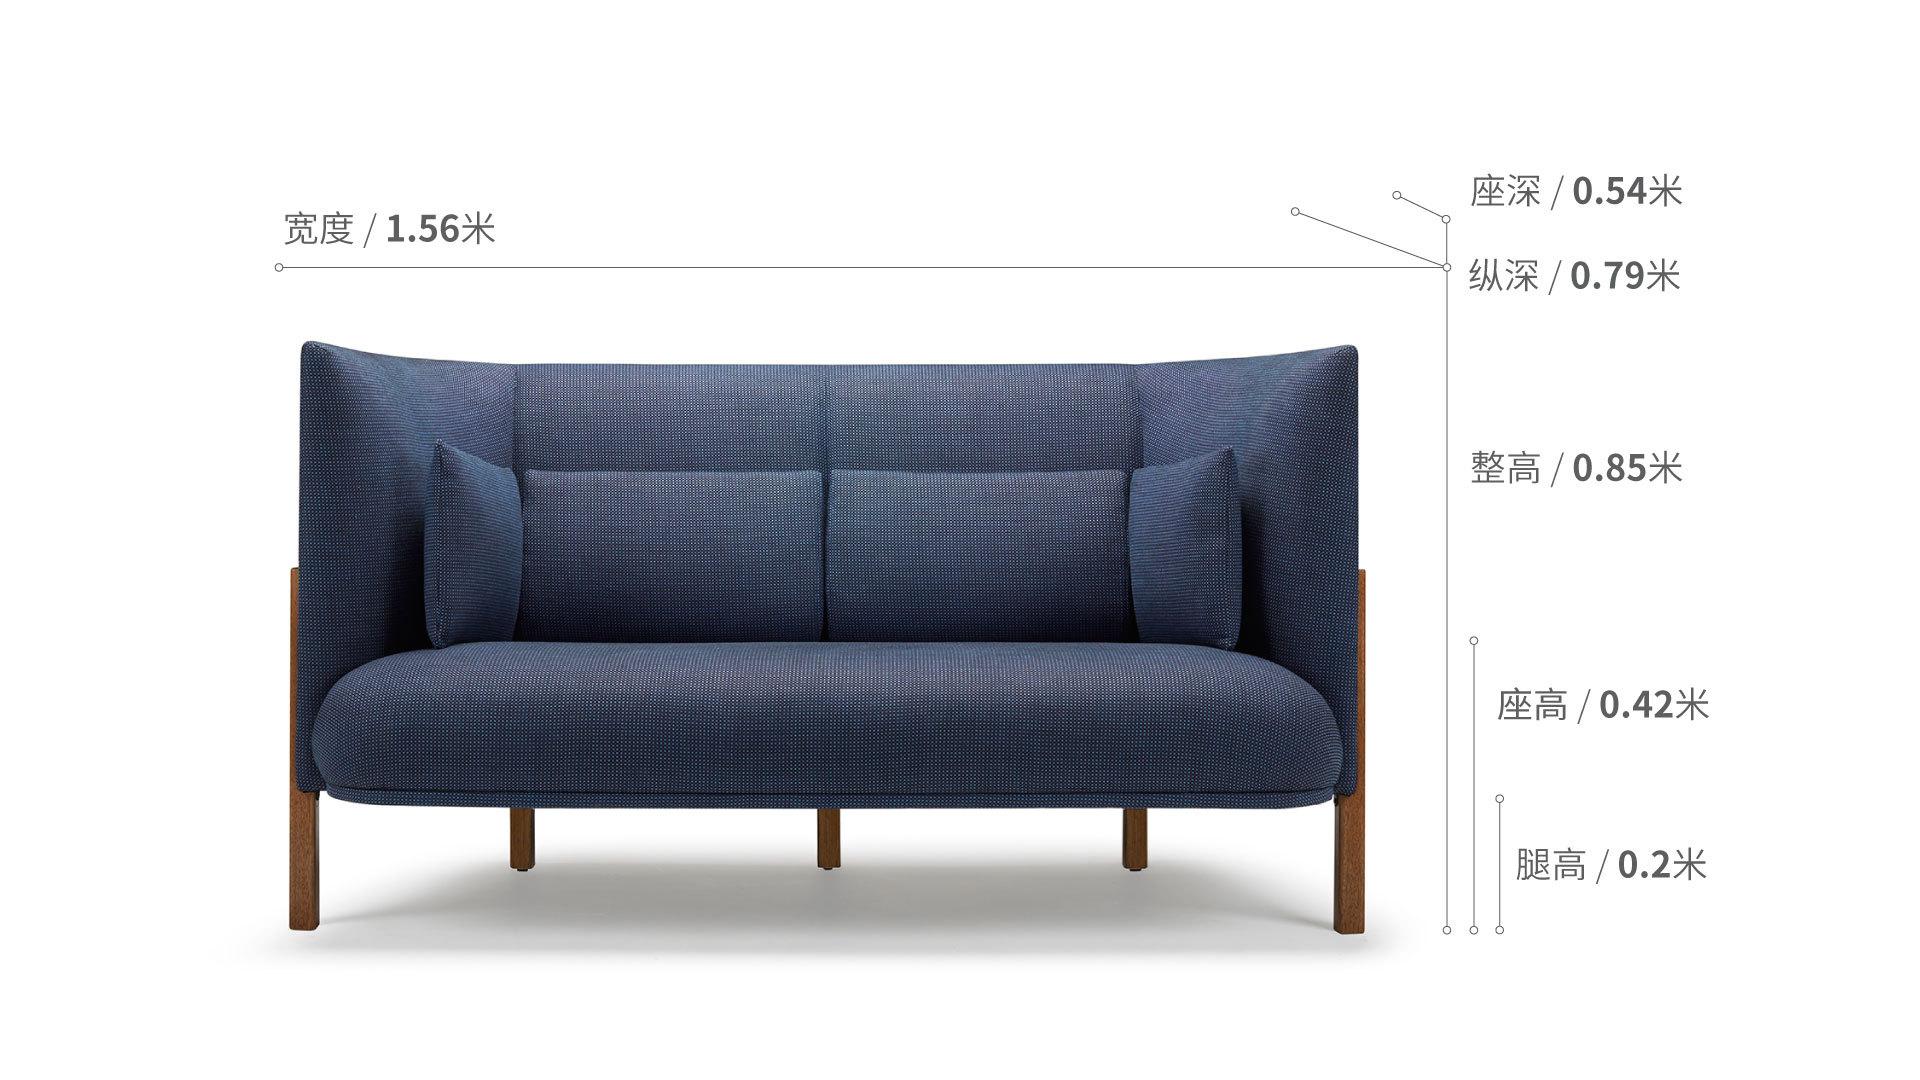 COFA双人座沙发效果图